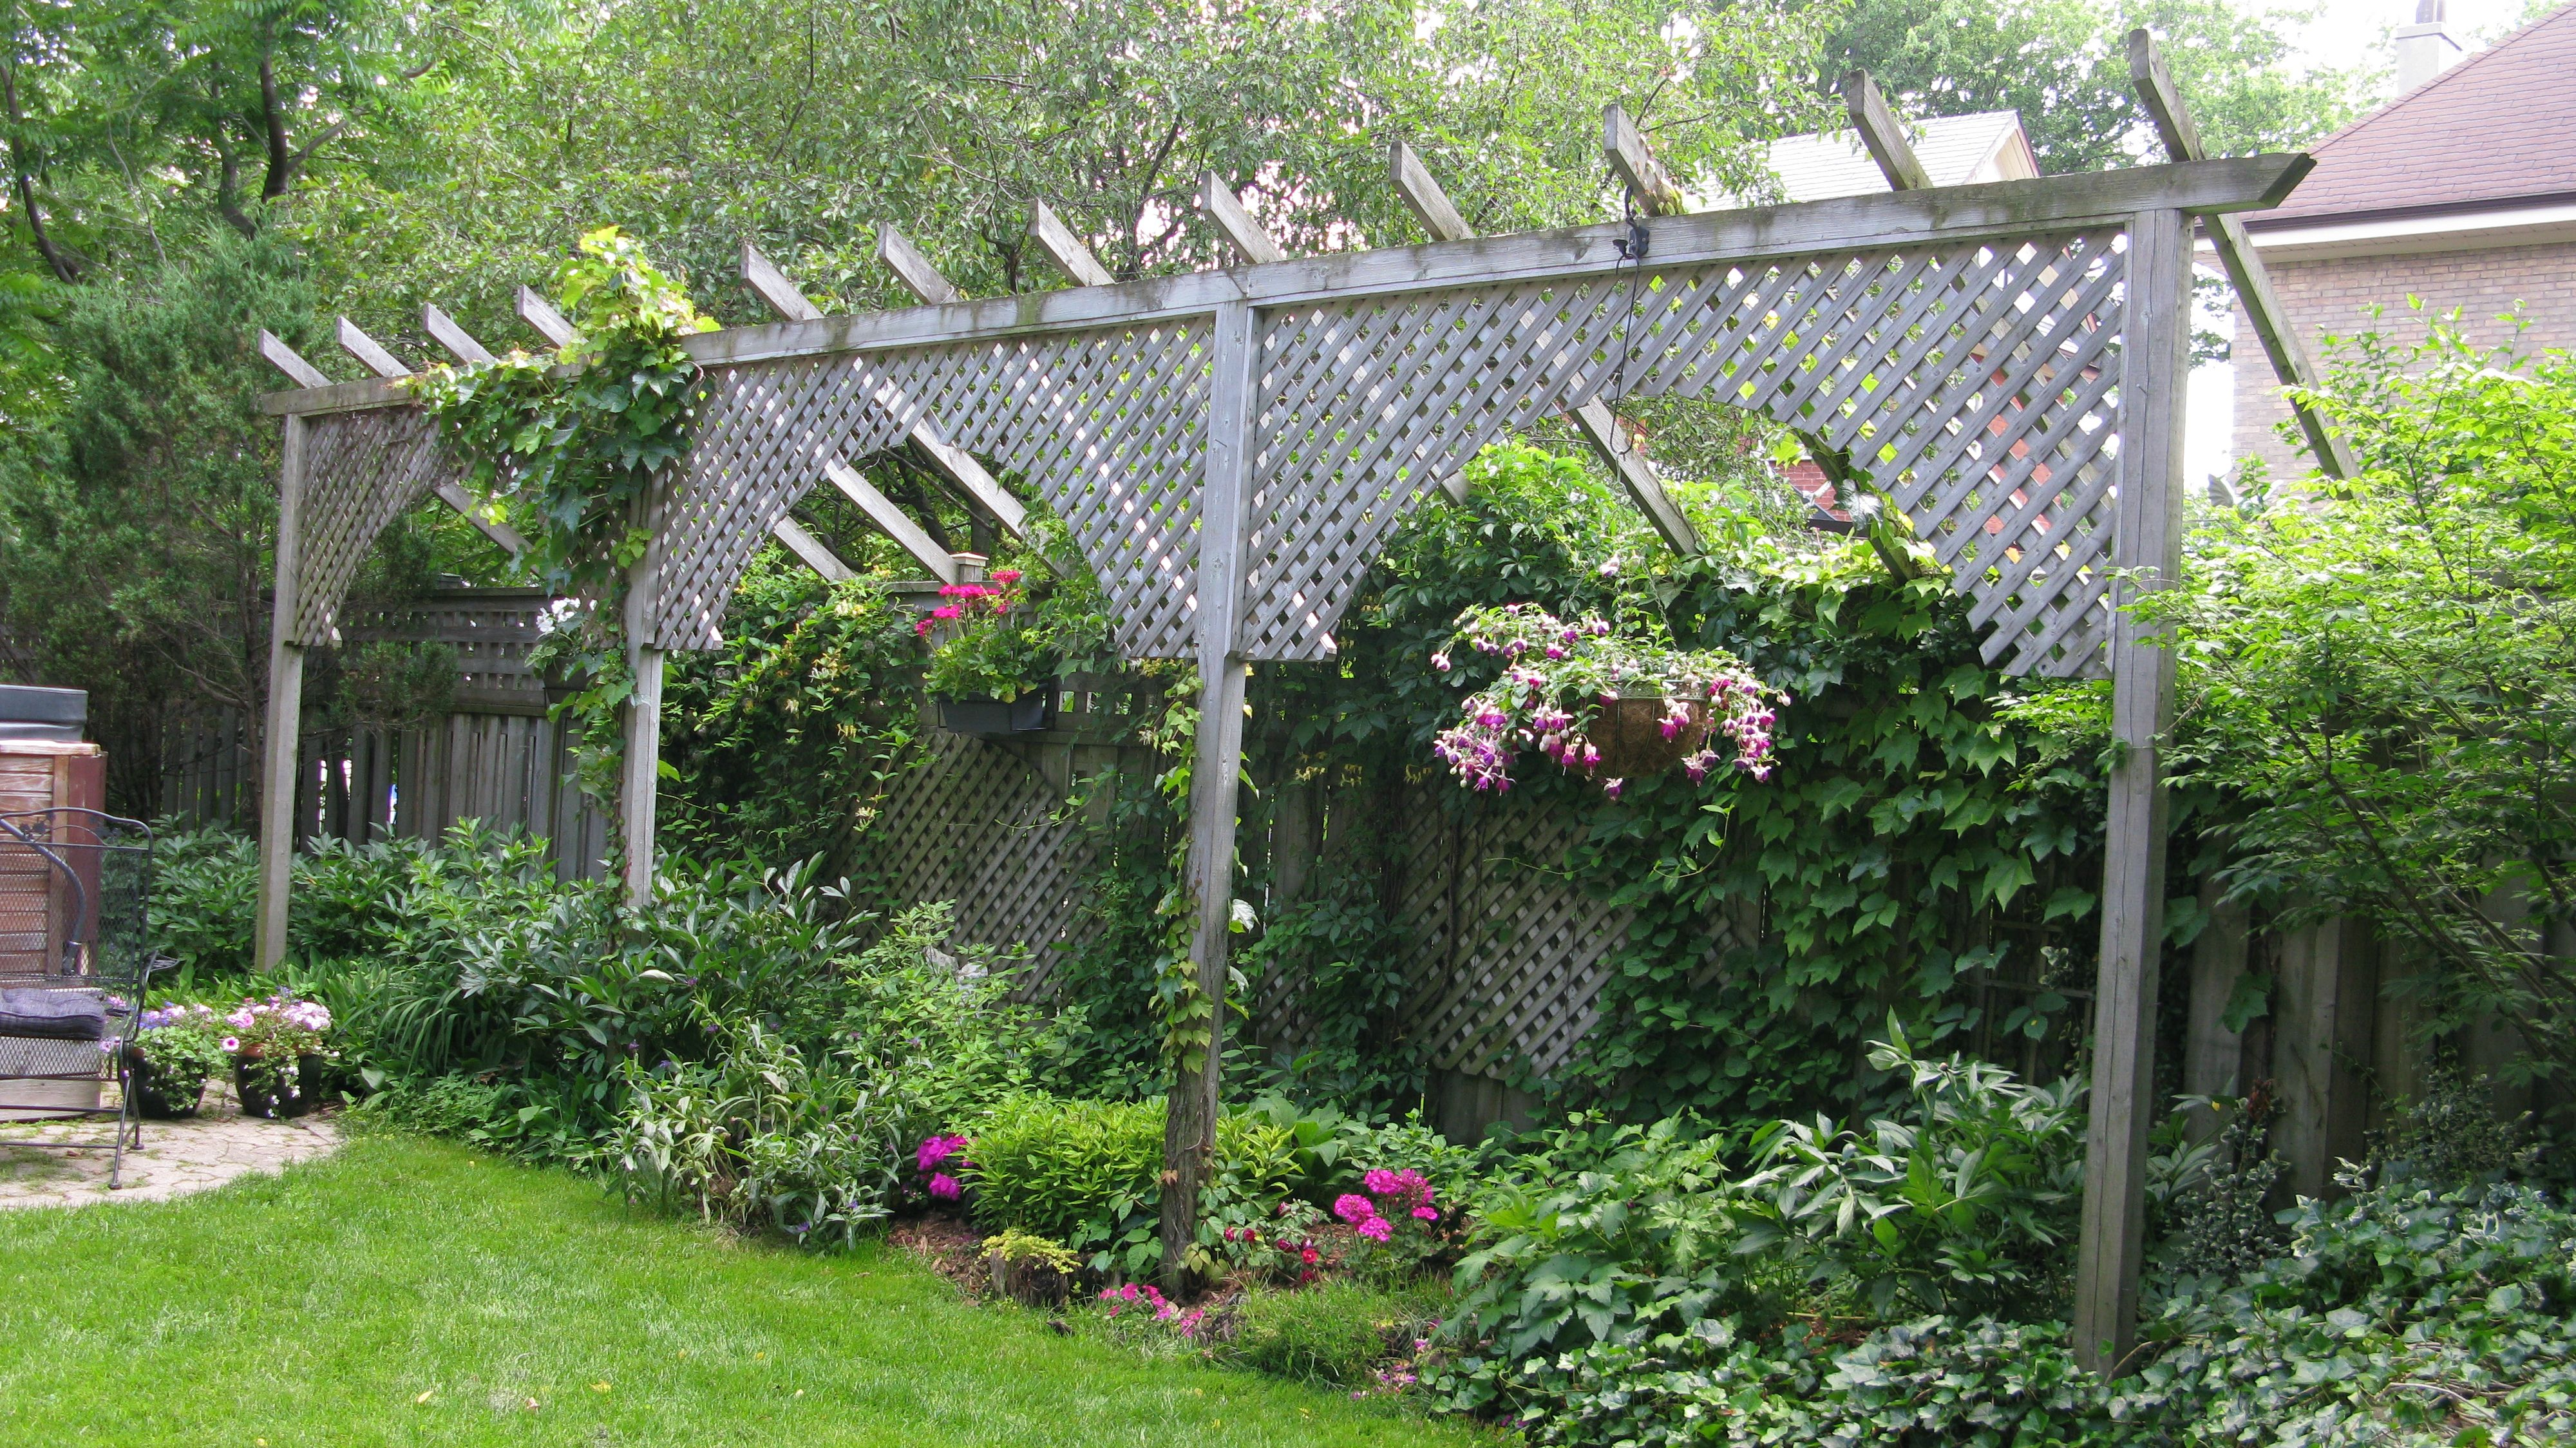 Medium Of Backyard Fence Art